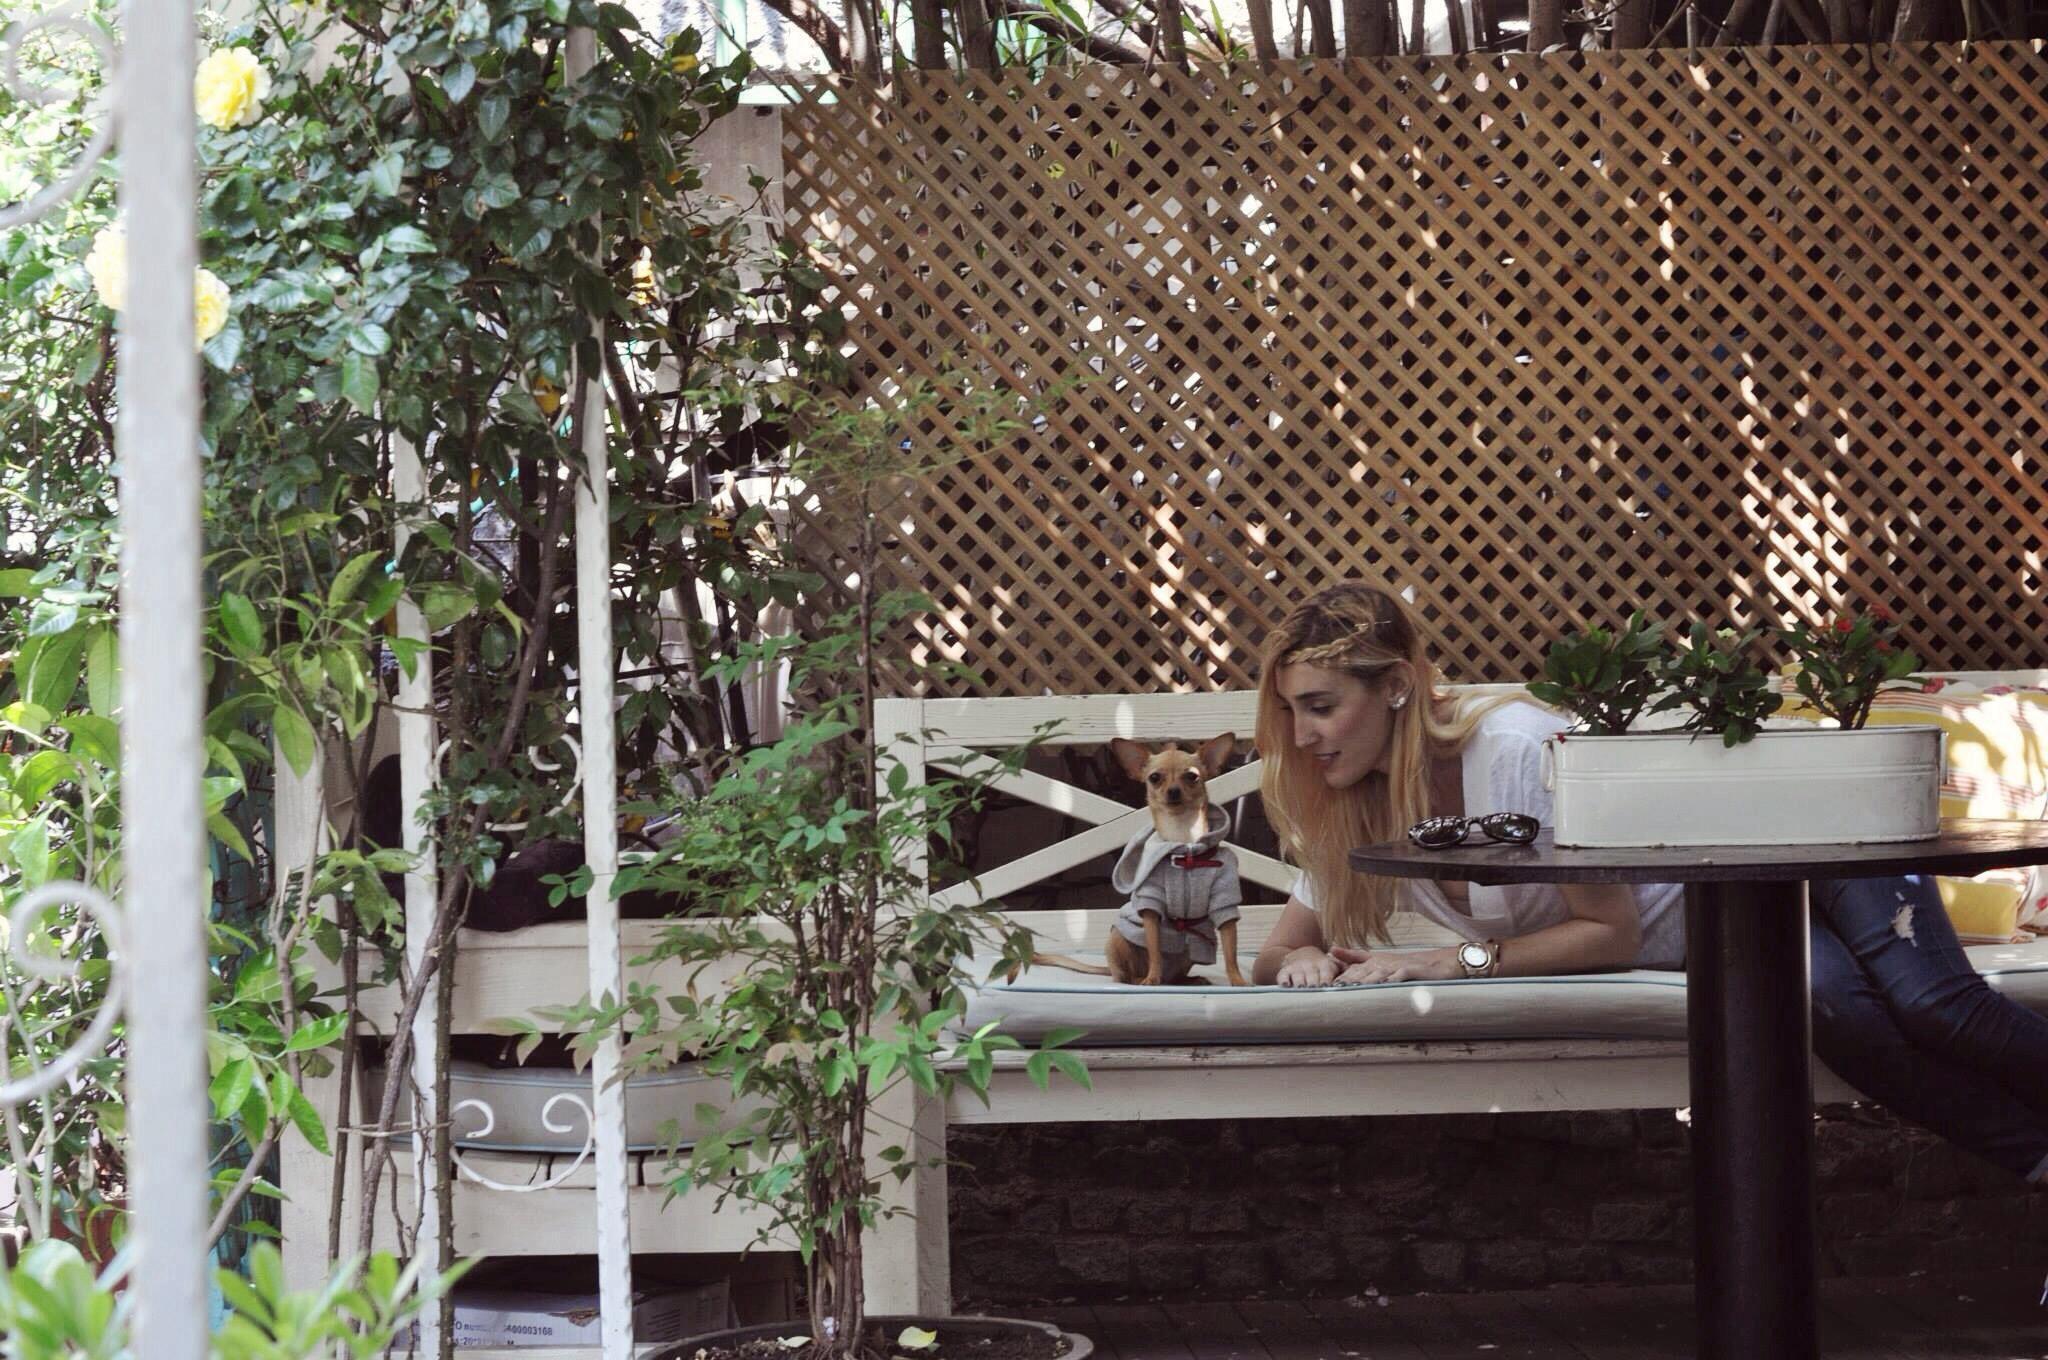 kopek girebilir, assk kahve-burcu-ozcan-assk-kahve-asskcafe-kurucesme-wuufbox-zarabasic-chihuahua_mira (20)